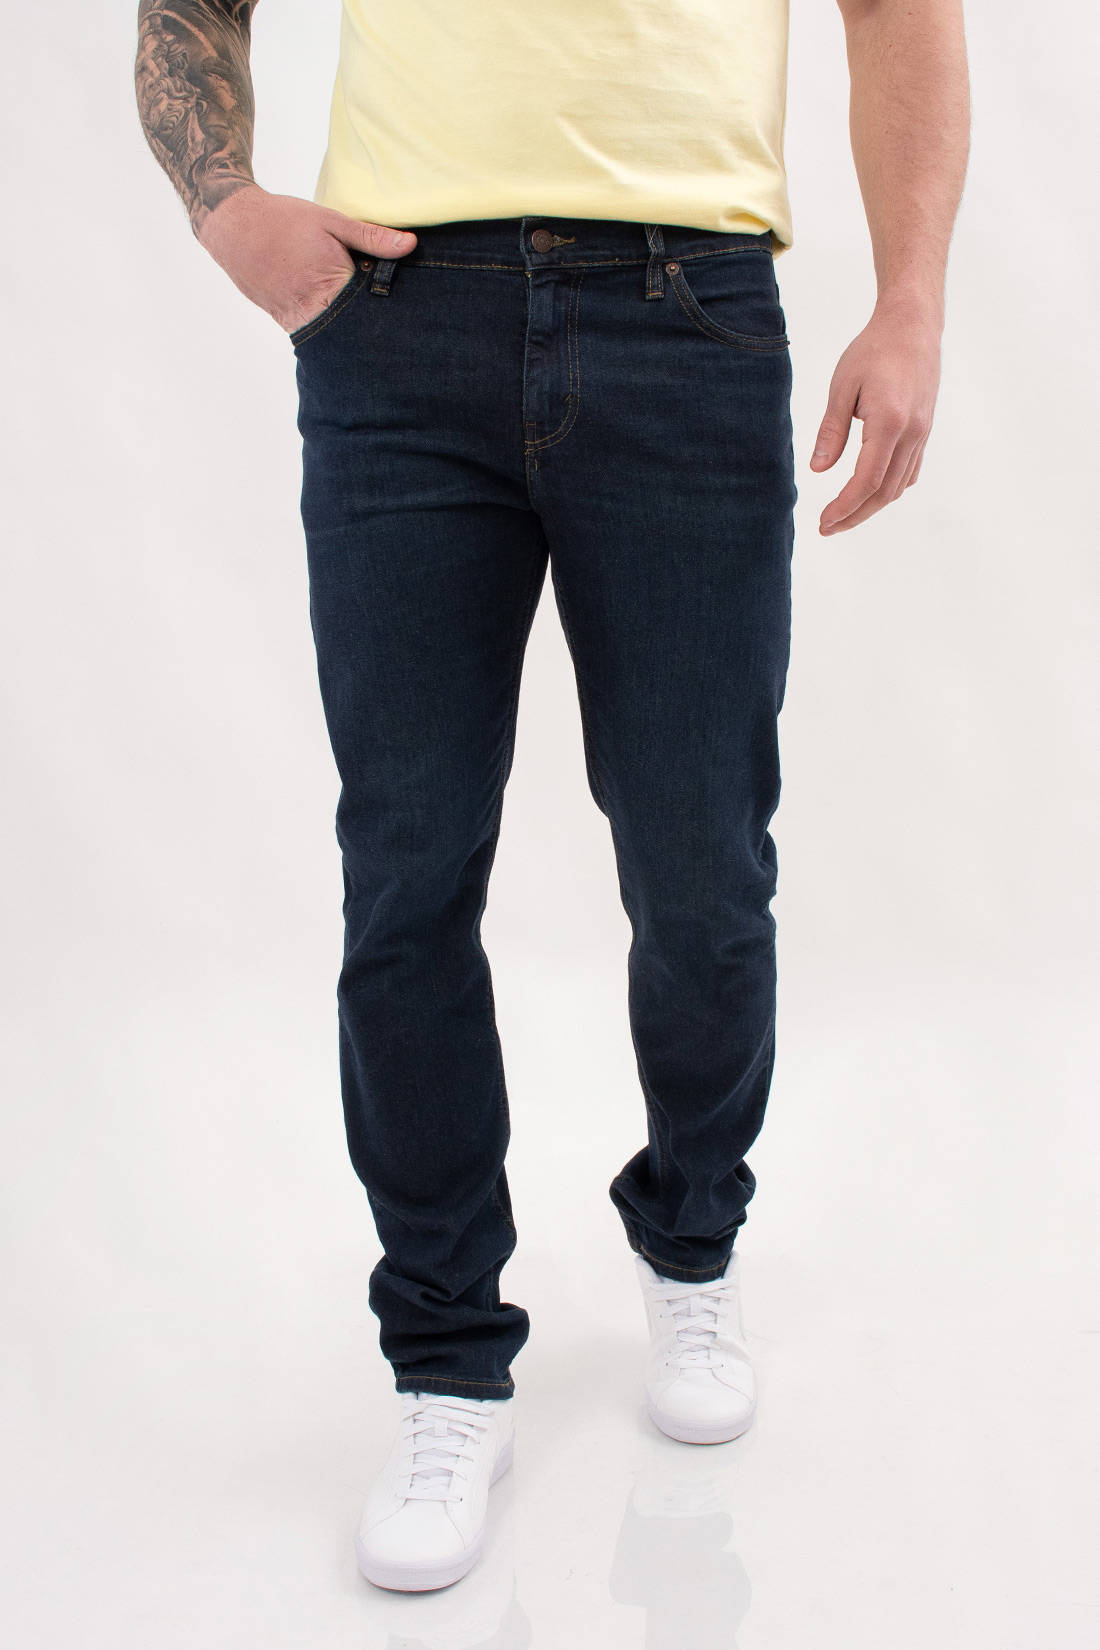 Calca Jeans Levis 511 Slim